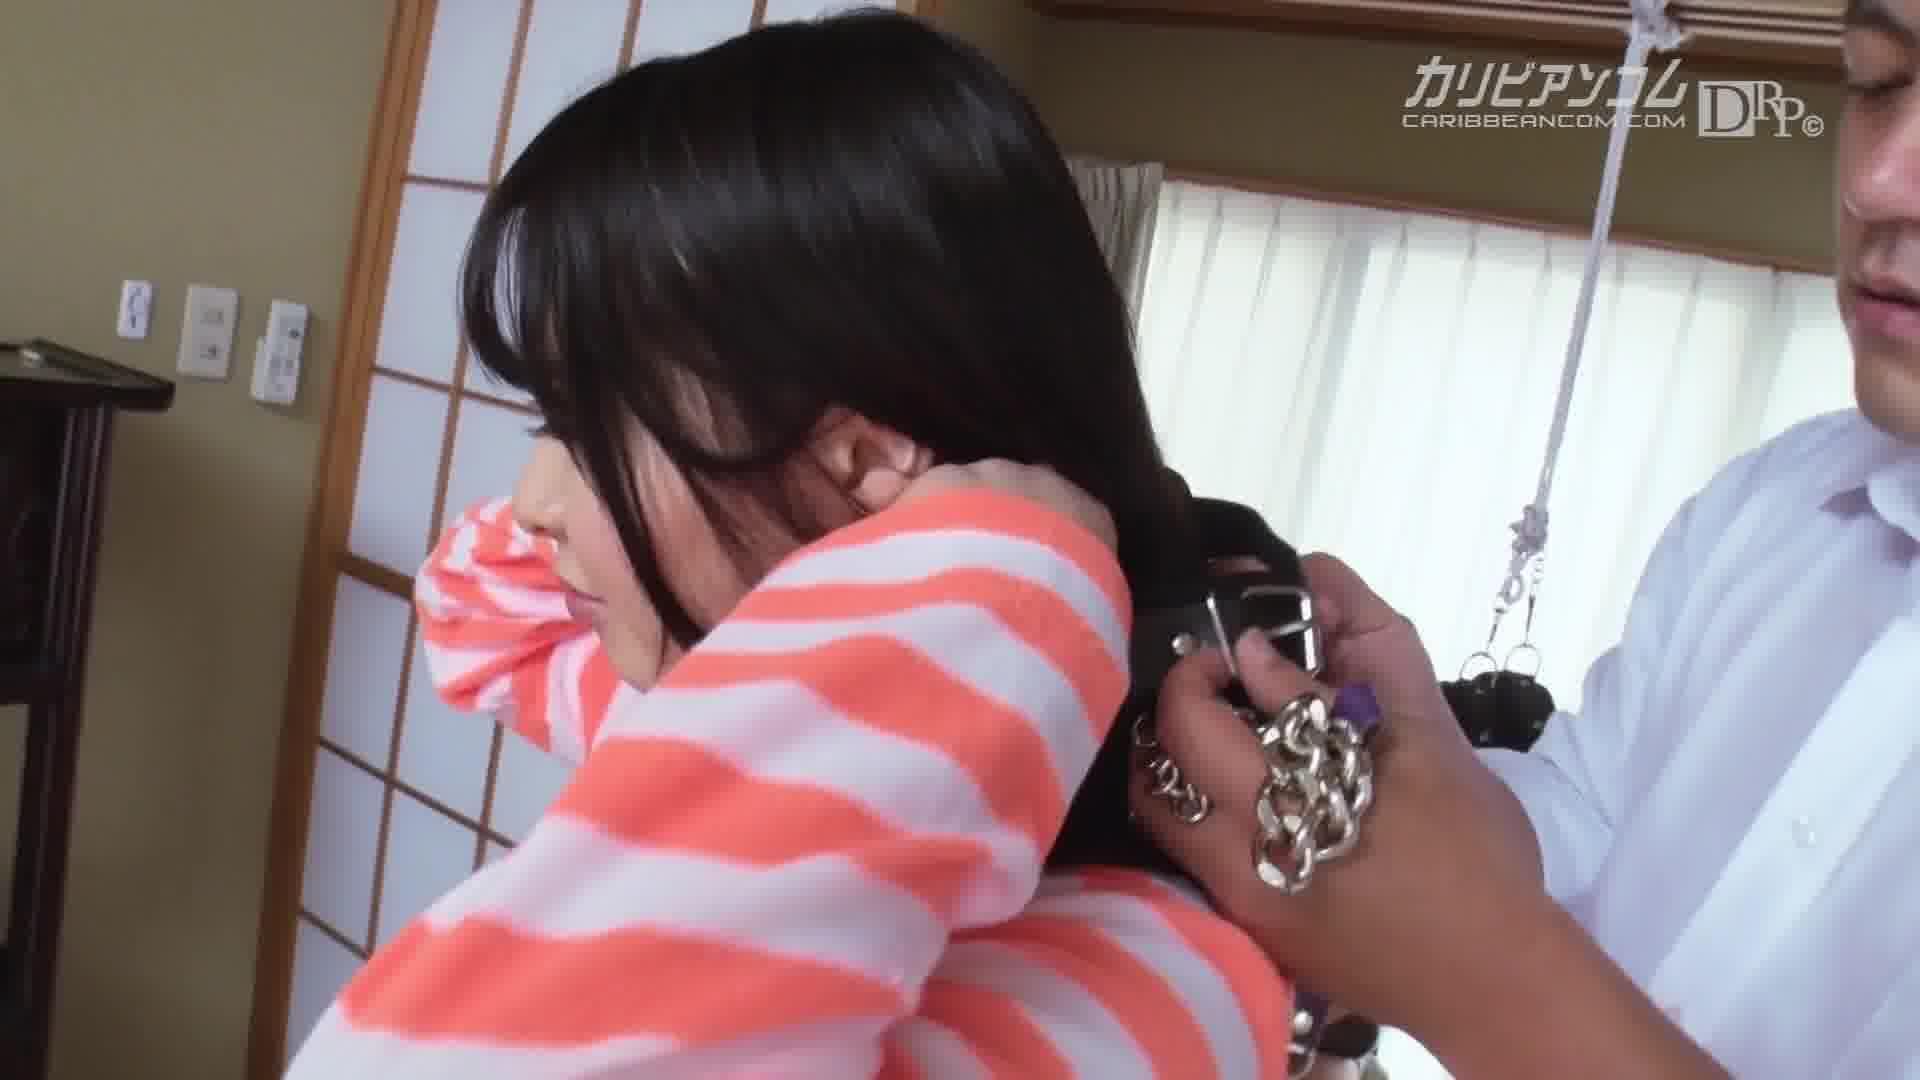 AVデビュー物語 ~私が夢を叶えてあげる!~ - 永瀬里美【巨乳・ハード系・イラマチオ】